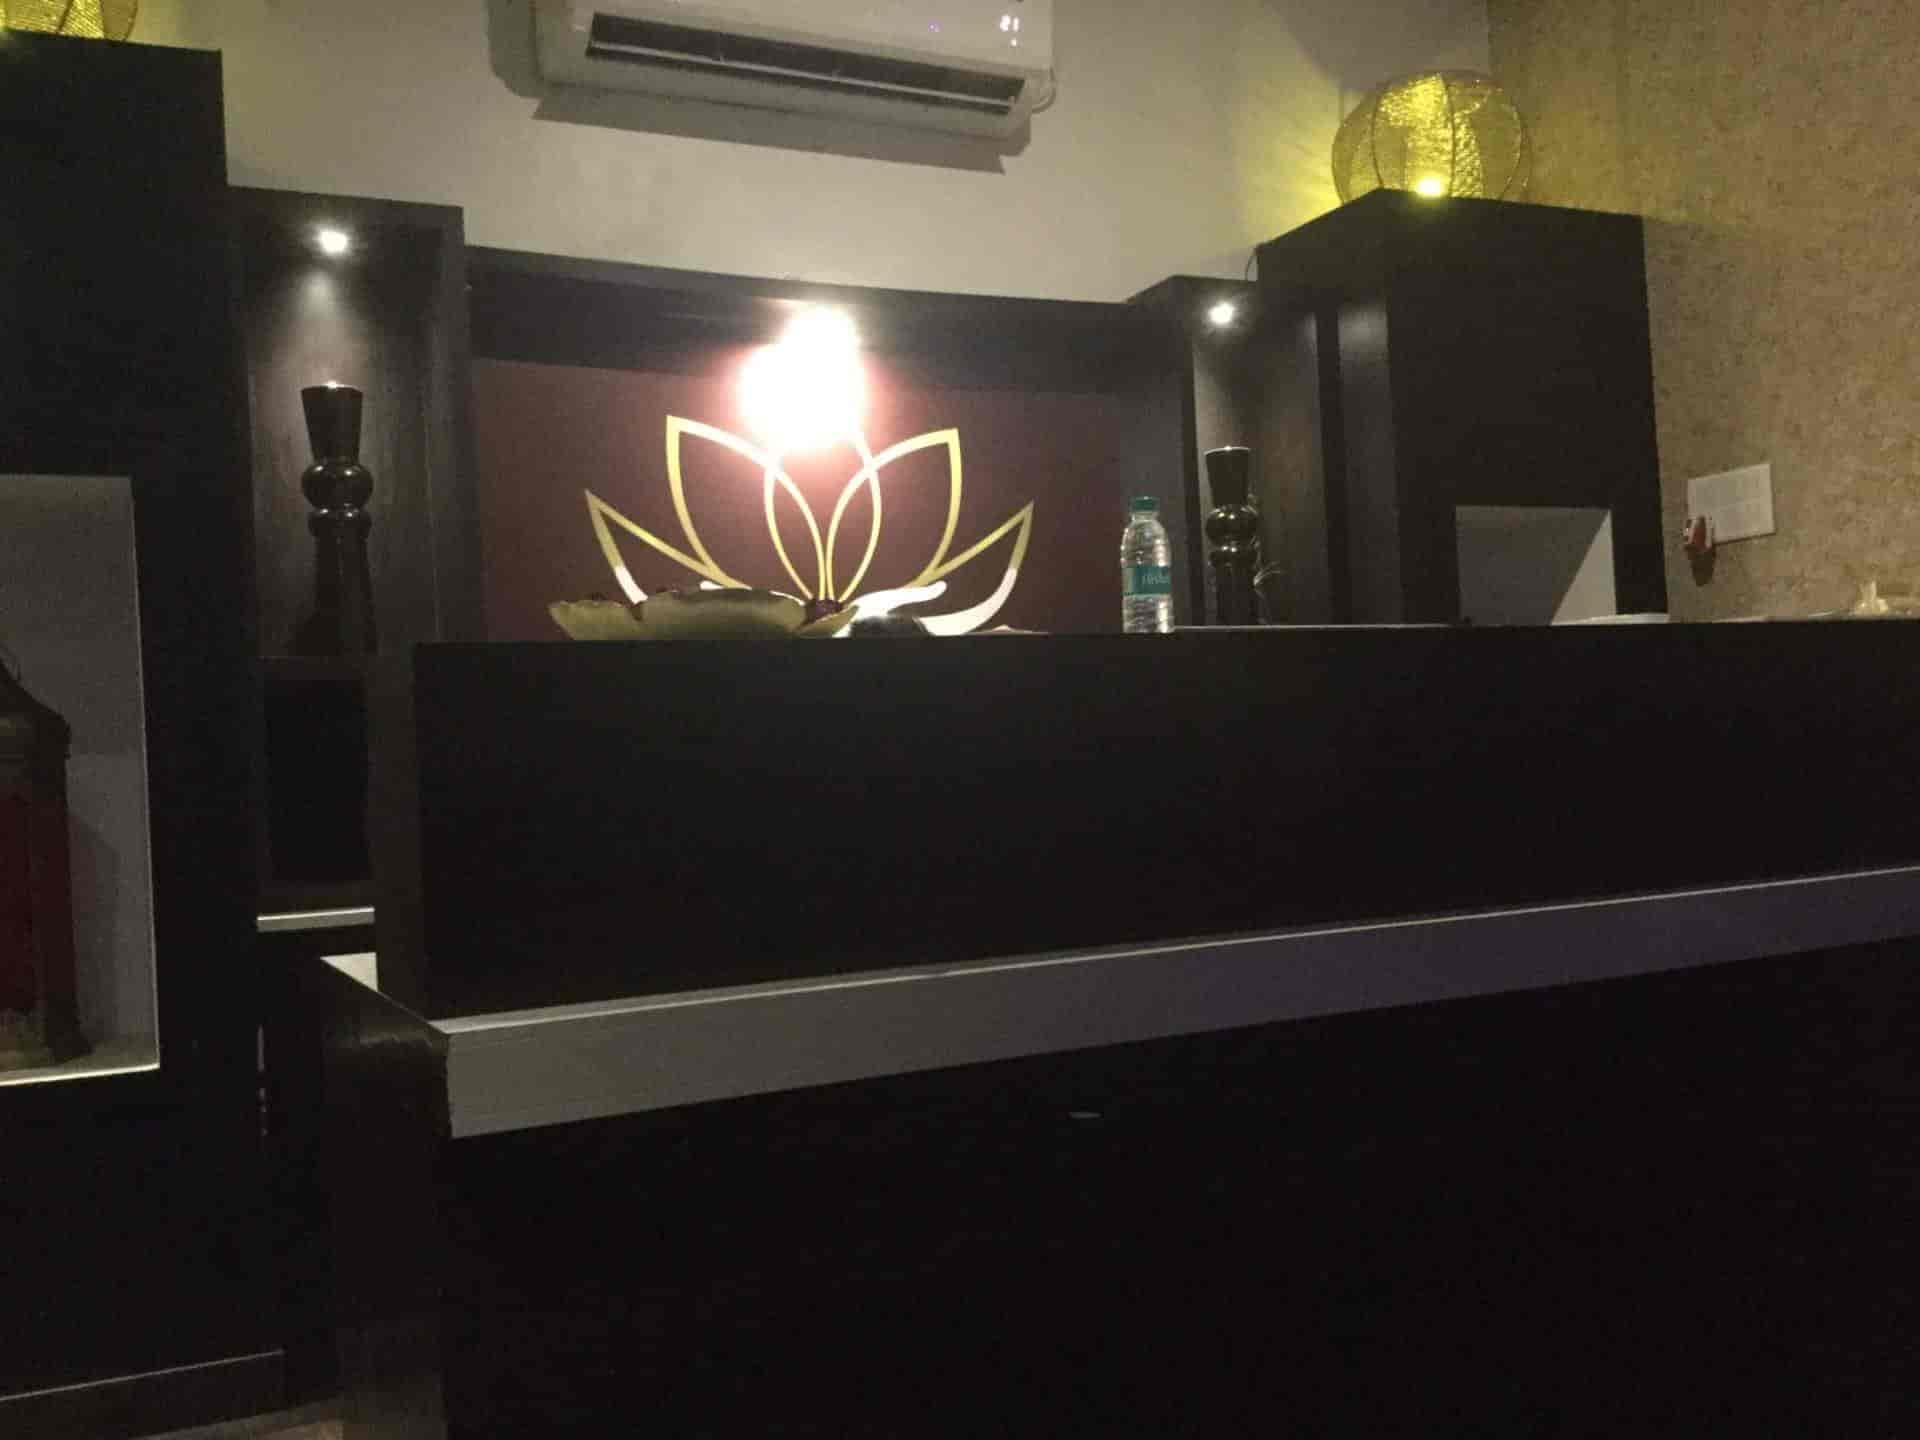 White Lotus Spa & Salon, Vasundhara Sector 15 - Beauty Spas